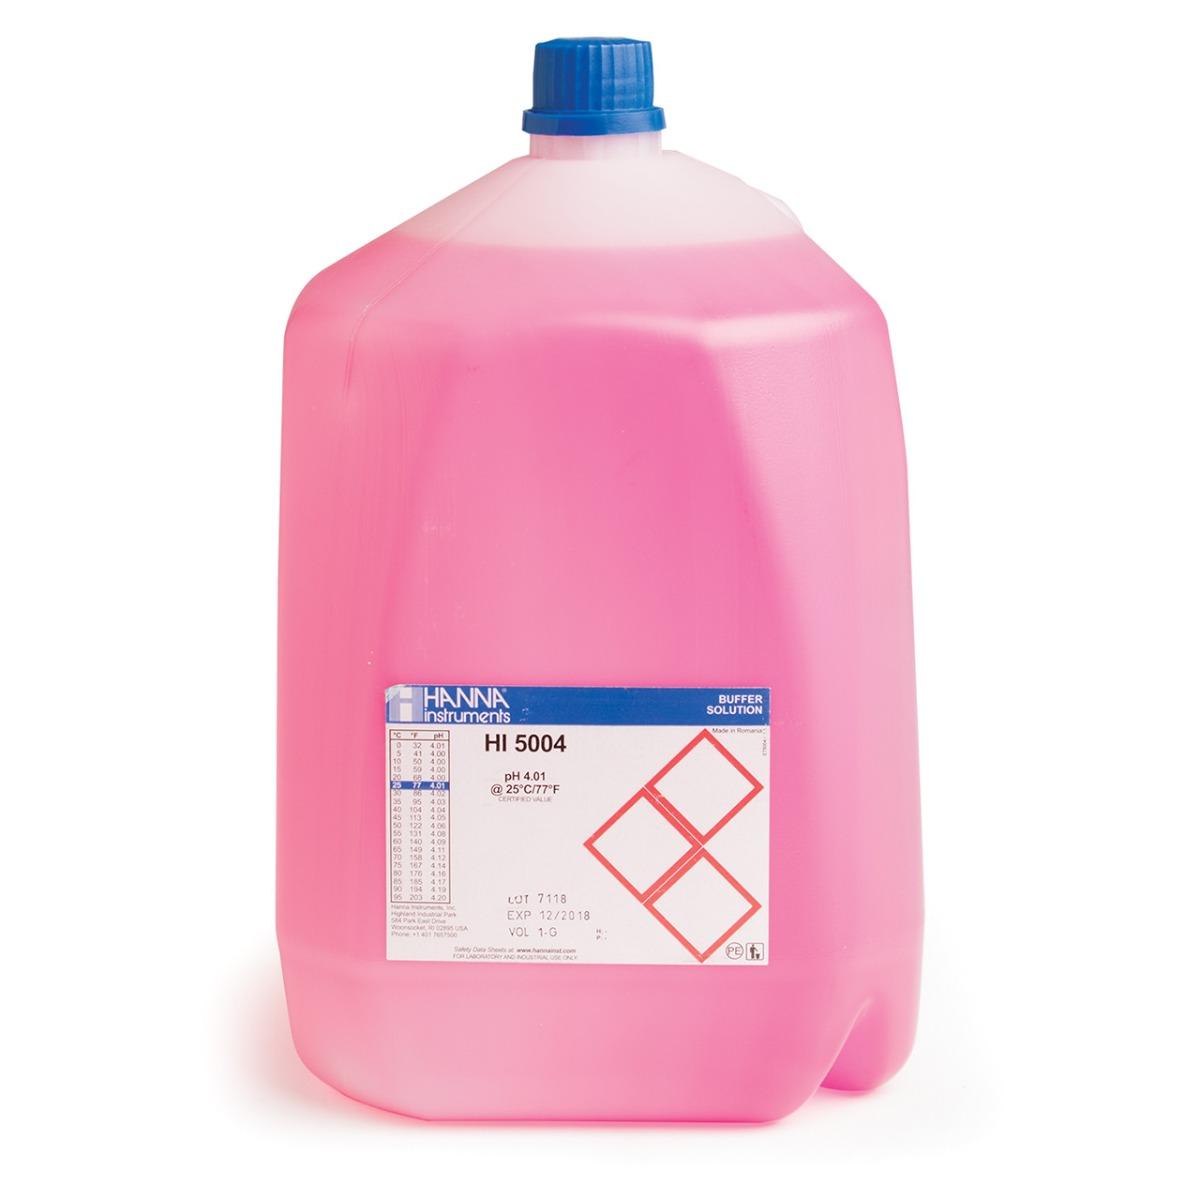 HI5004-R08 pH 4.01 Technical Calibration Buffer (1G (3.78L))